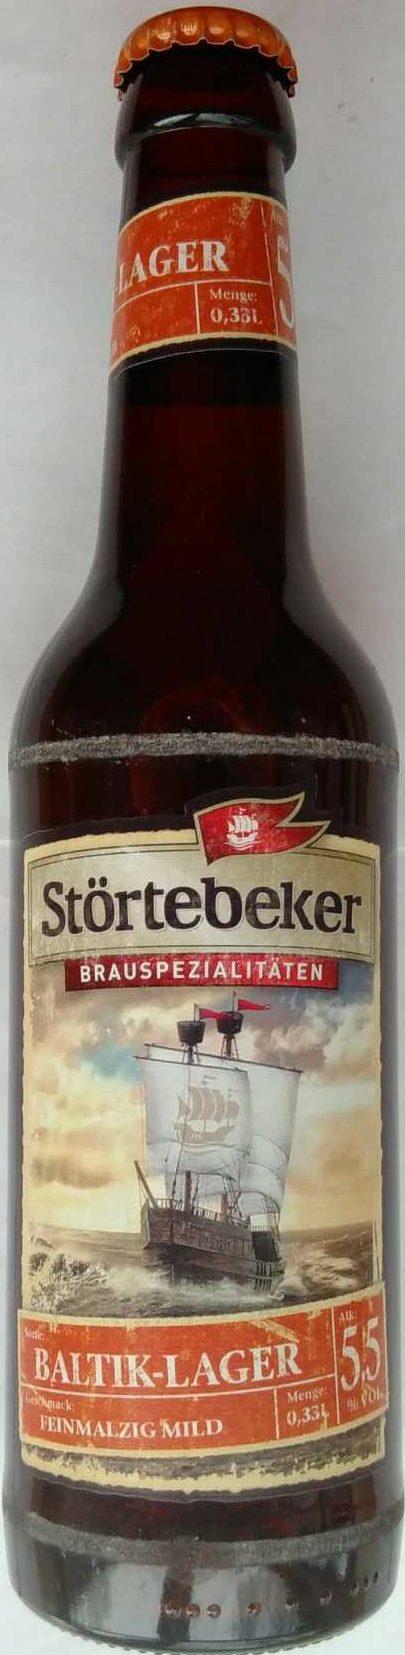 Baltik-Lager - Product